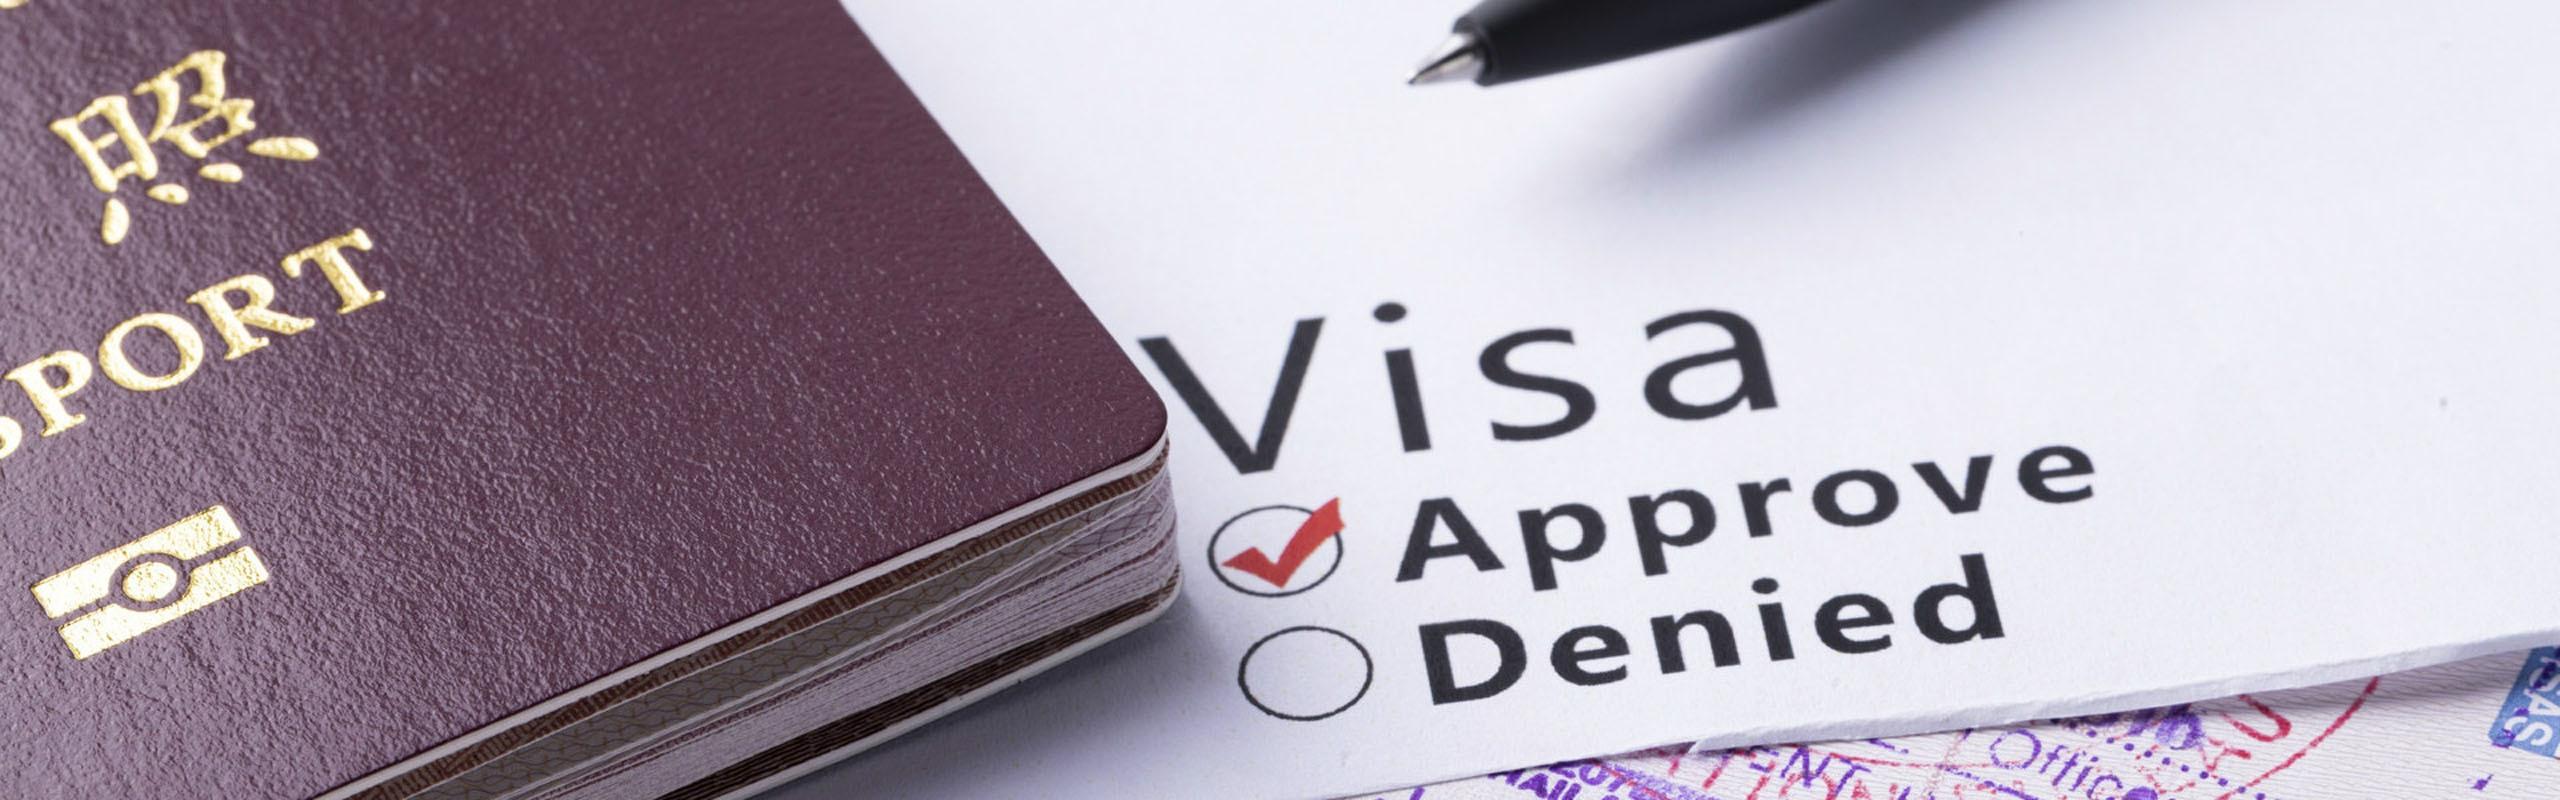 Cambodia Visa,How to get a Cambodia Visa, How to apply for a Cambodia Visa